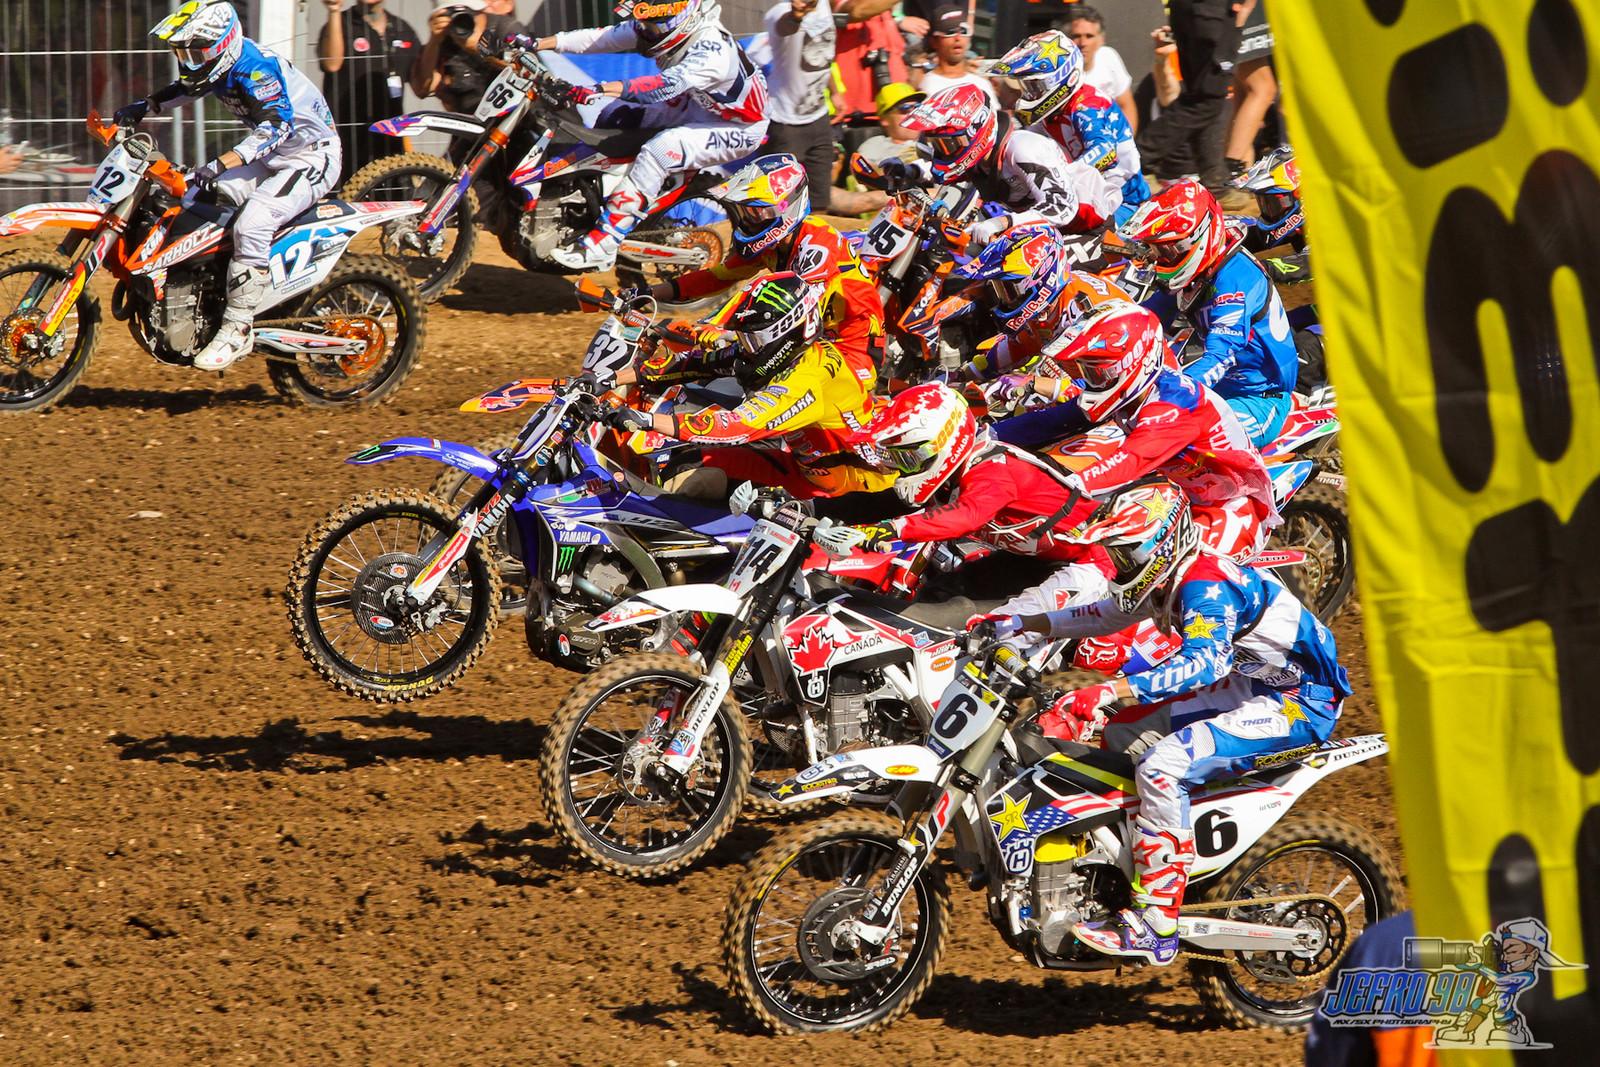 Race 2 start - PhotoGallery: MXoN Sunday - Motocross Pictures - Vital MX